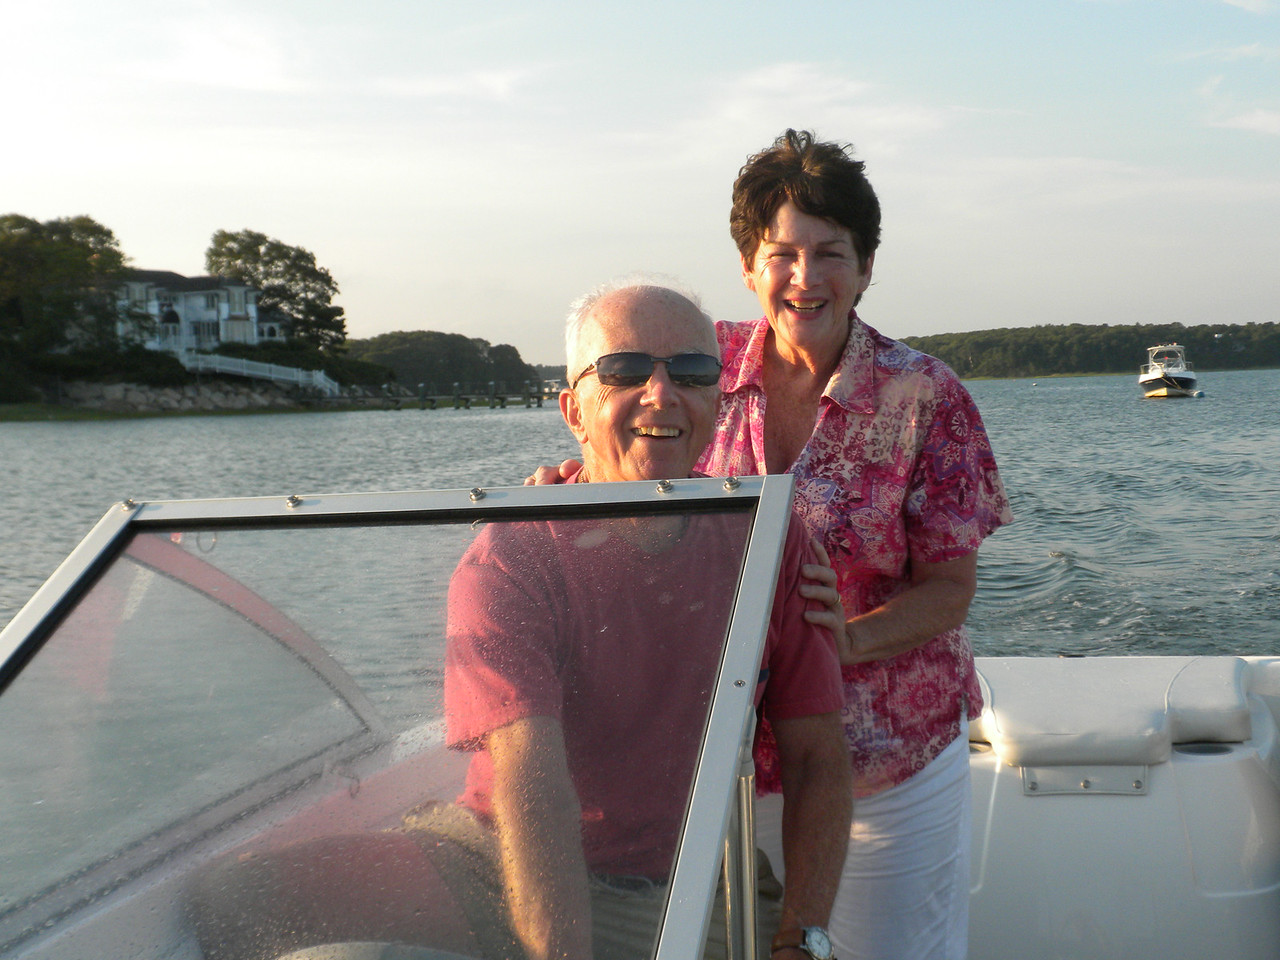 Cape Cod @ Summer 2012